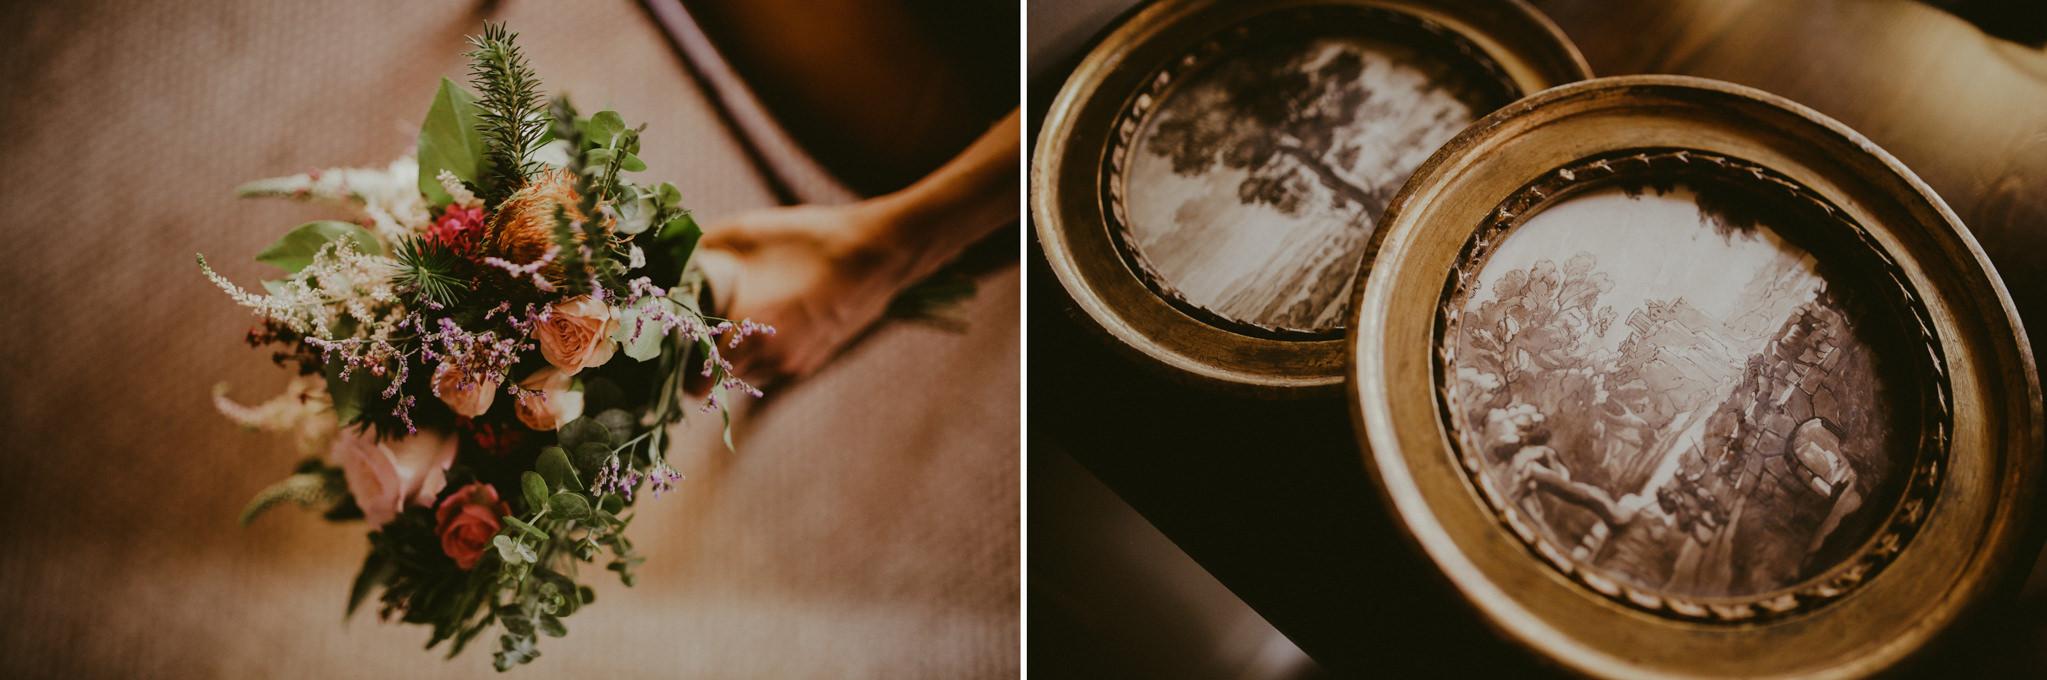 boda-diferente-fotografo-boda-laspalmas-grancanaria-104